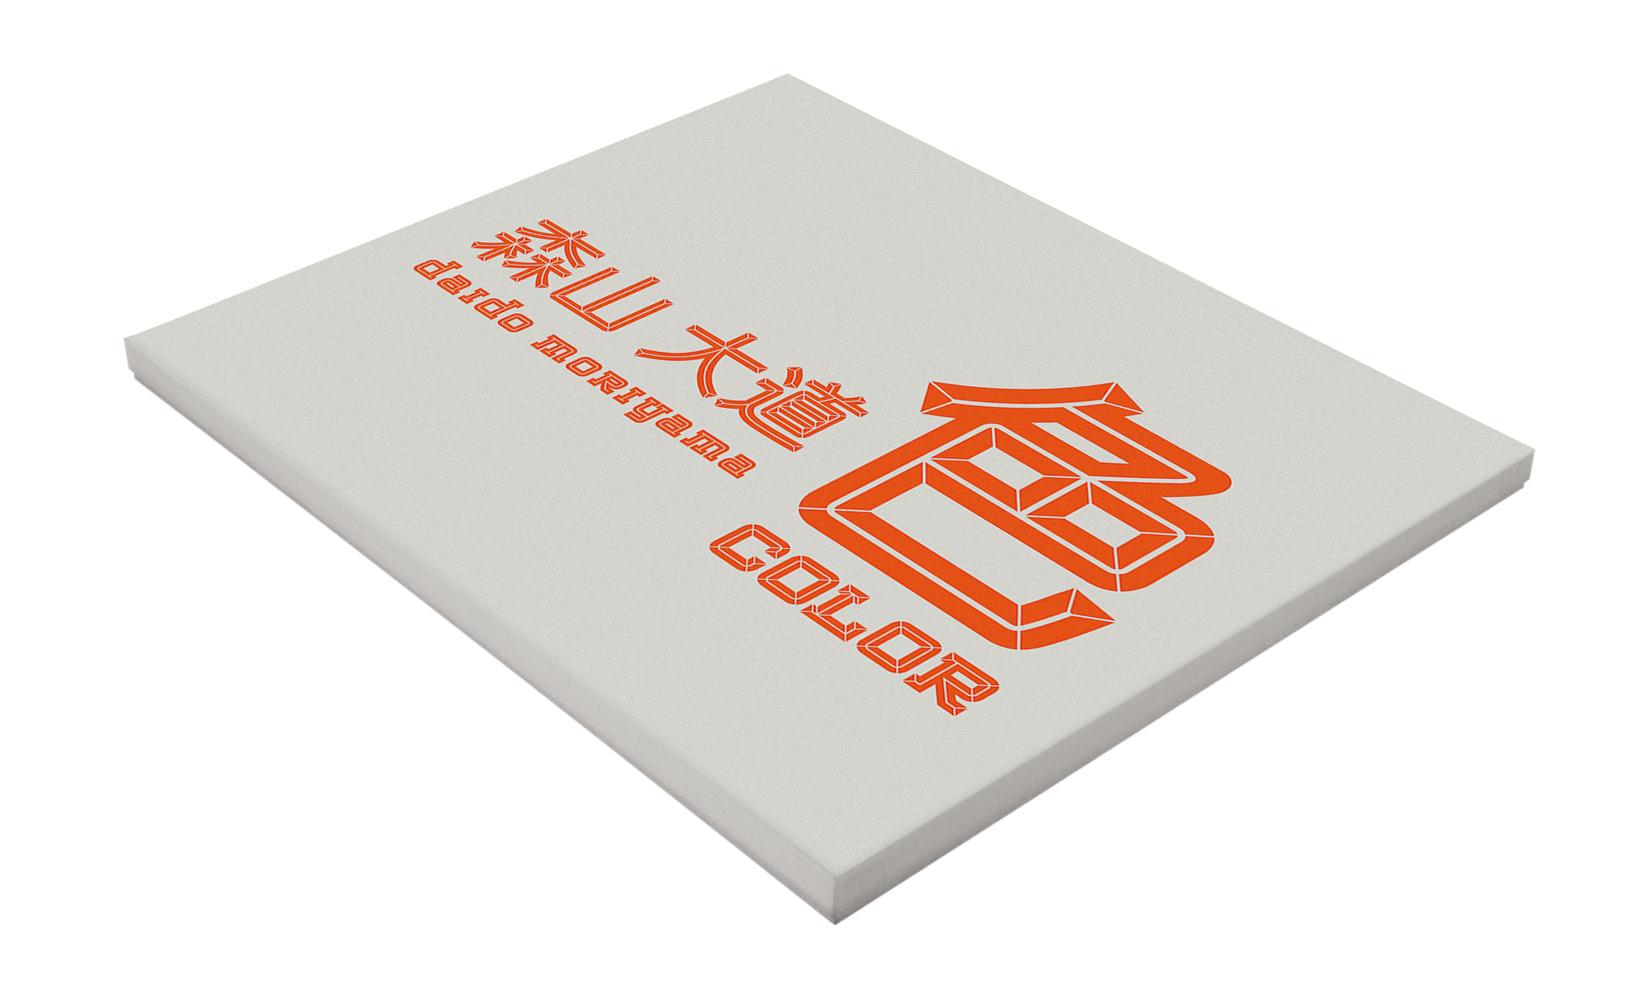 001-moriyama-color.jpg